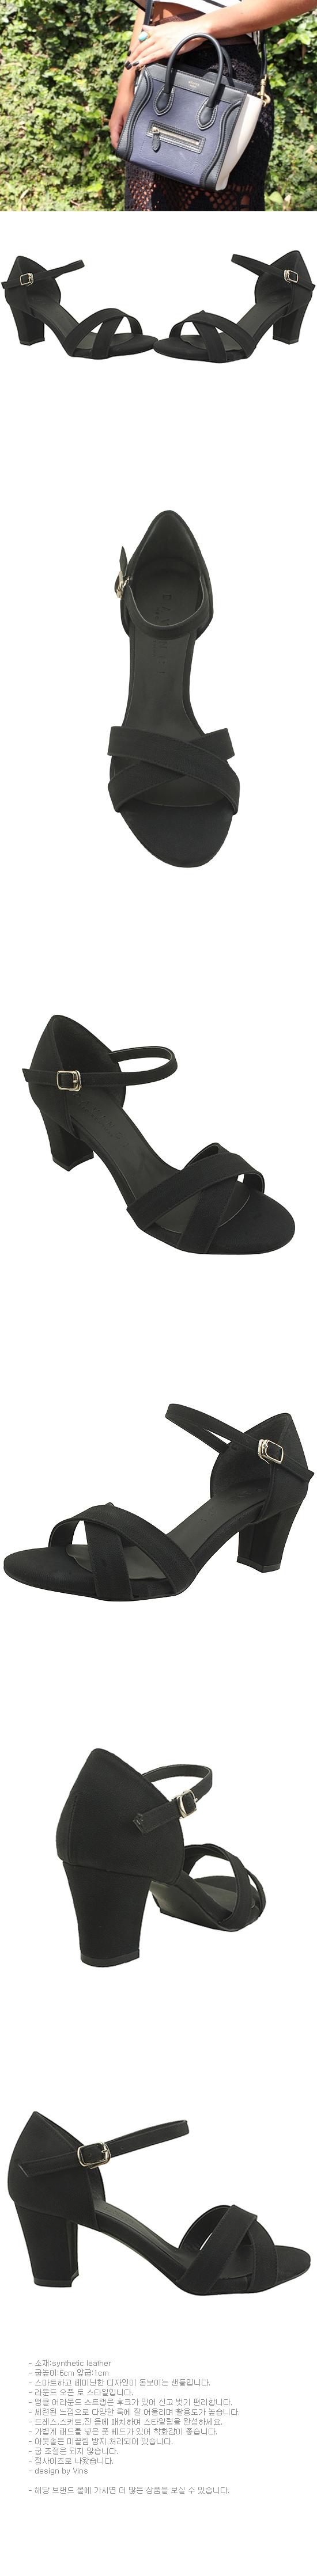 Cross strap sandals black